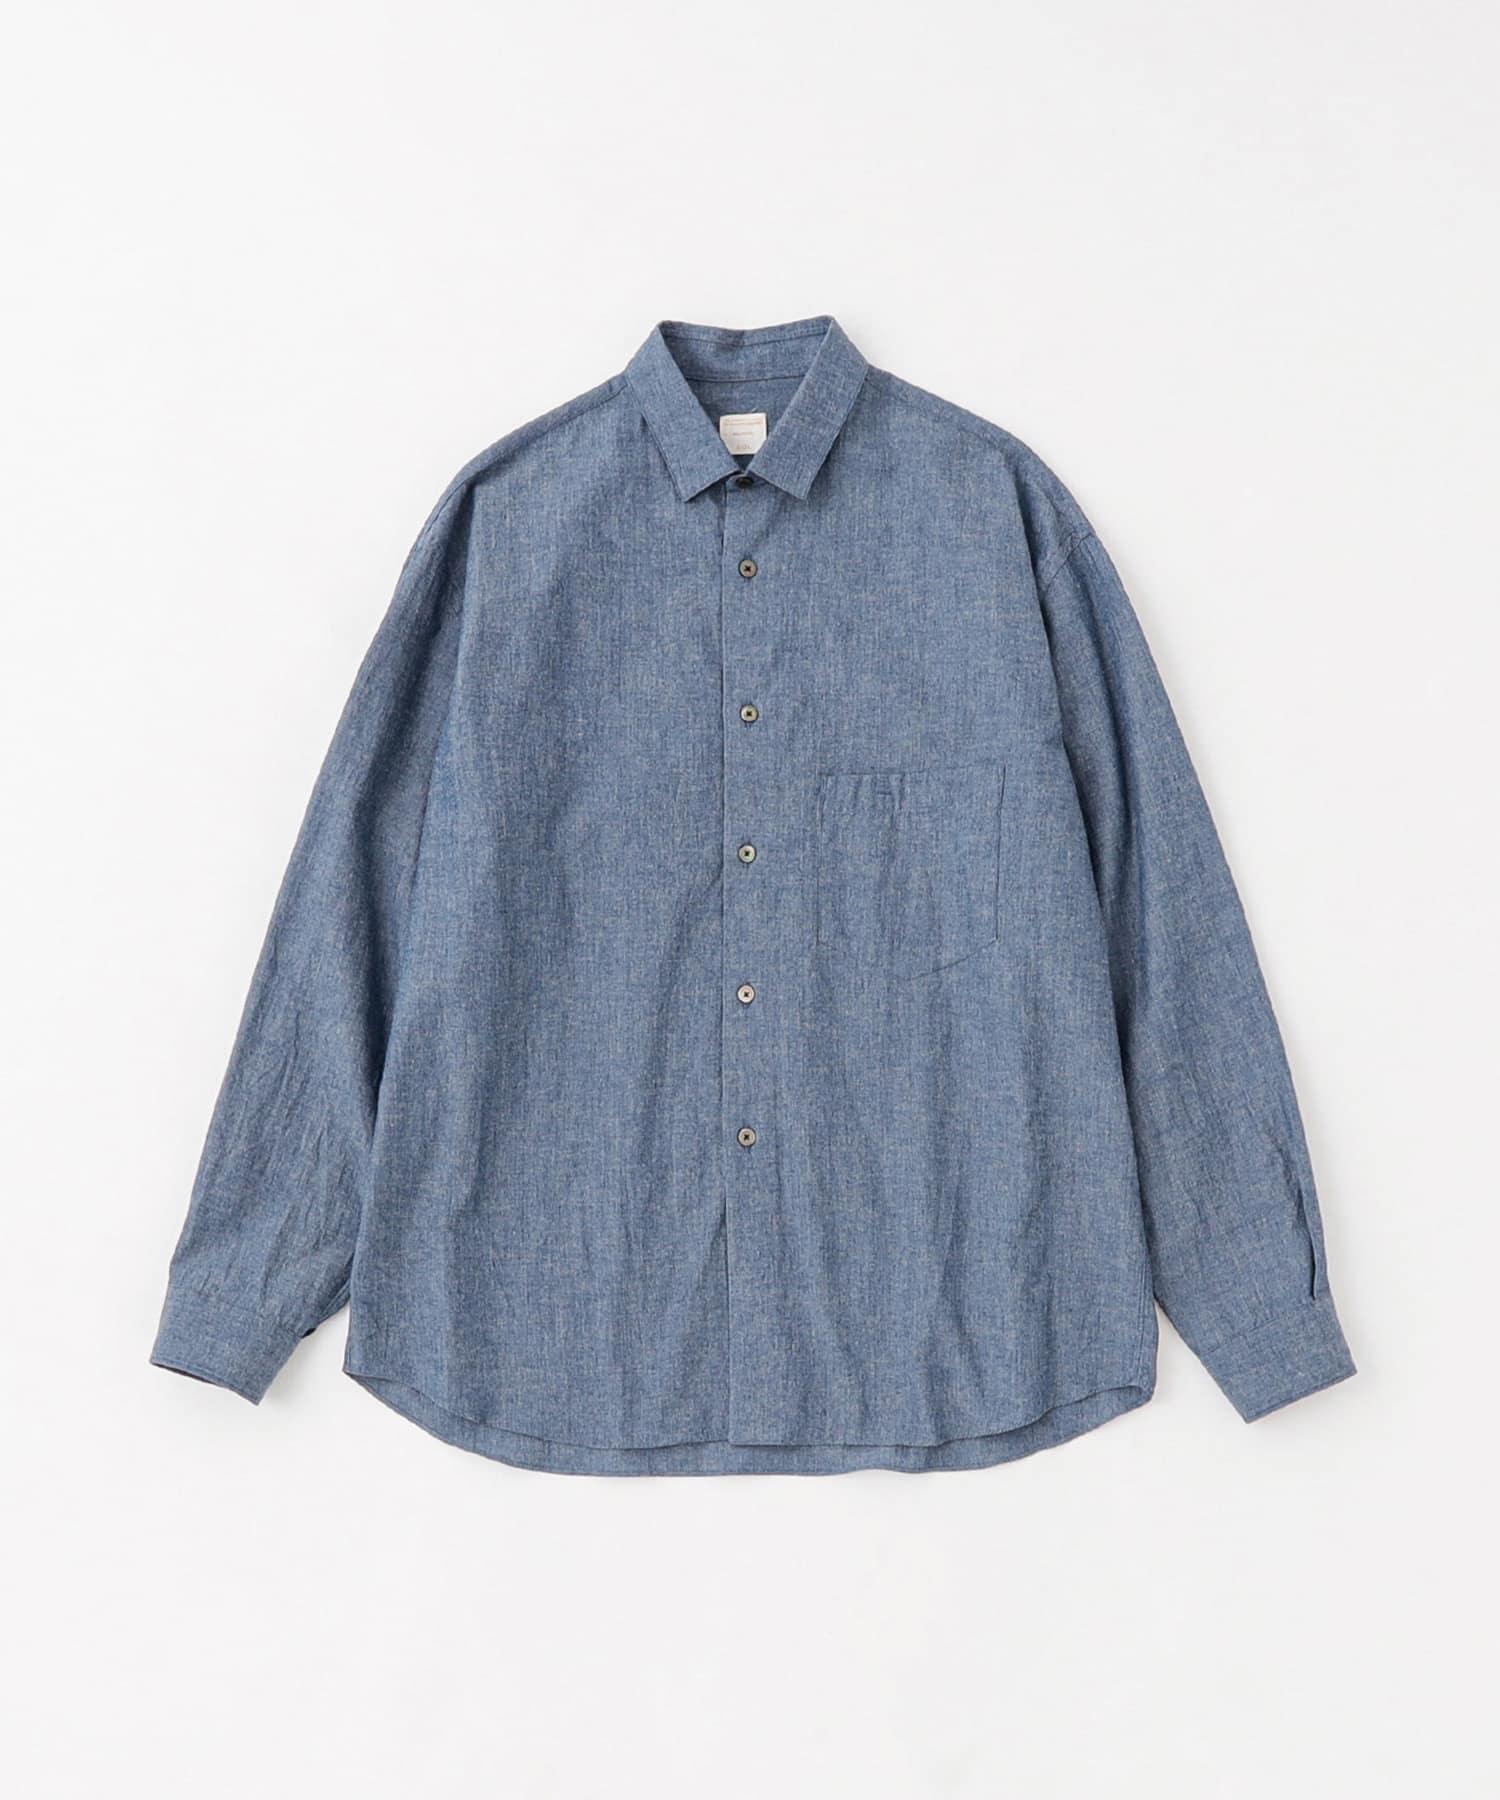 BLOOM&BRANCH(ブルームアンドブランチ) PHLANNÈL SOL / Landscape Shirt